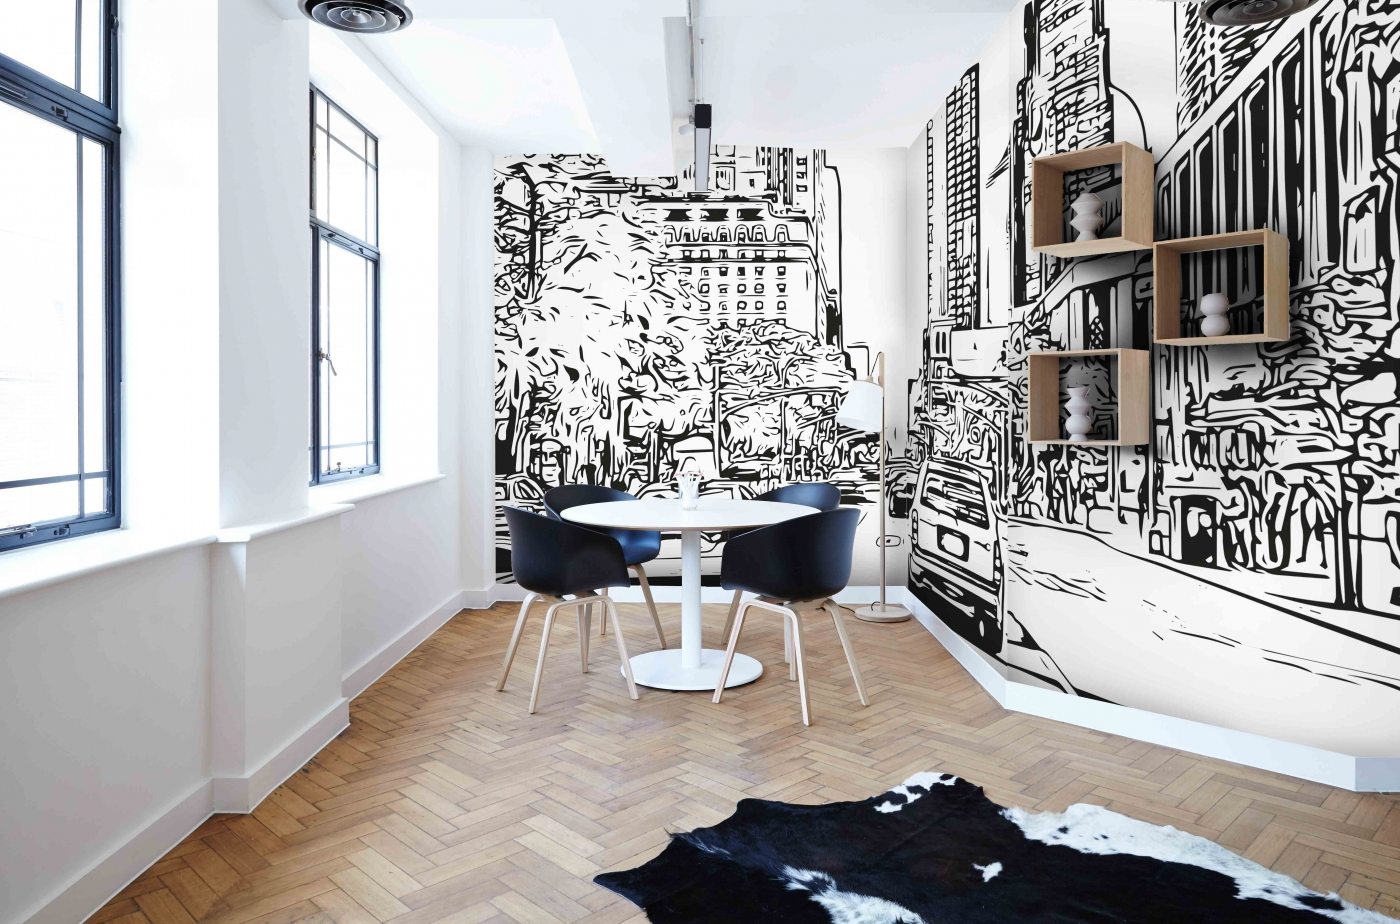 Tapeta Skica New York City, 216 x 140 cm